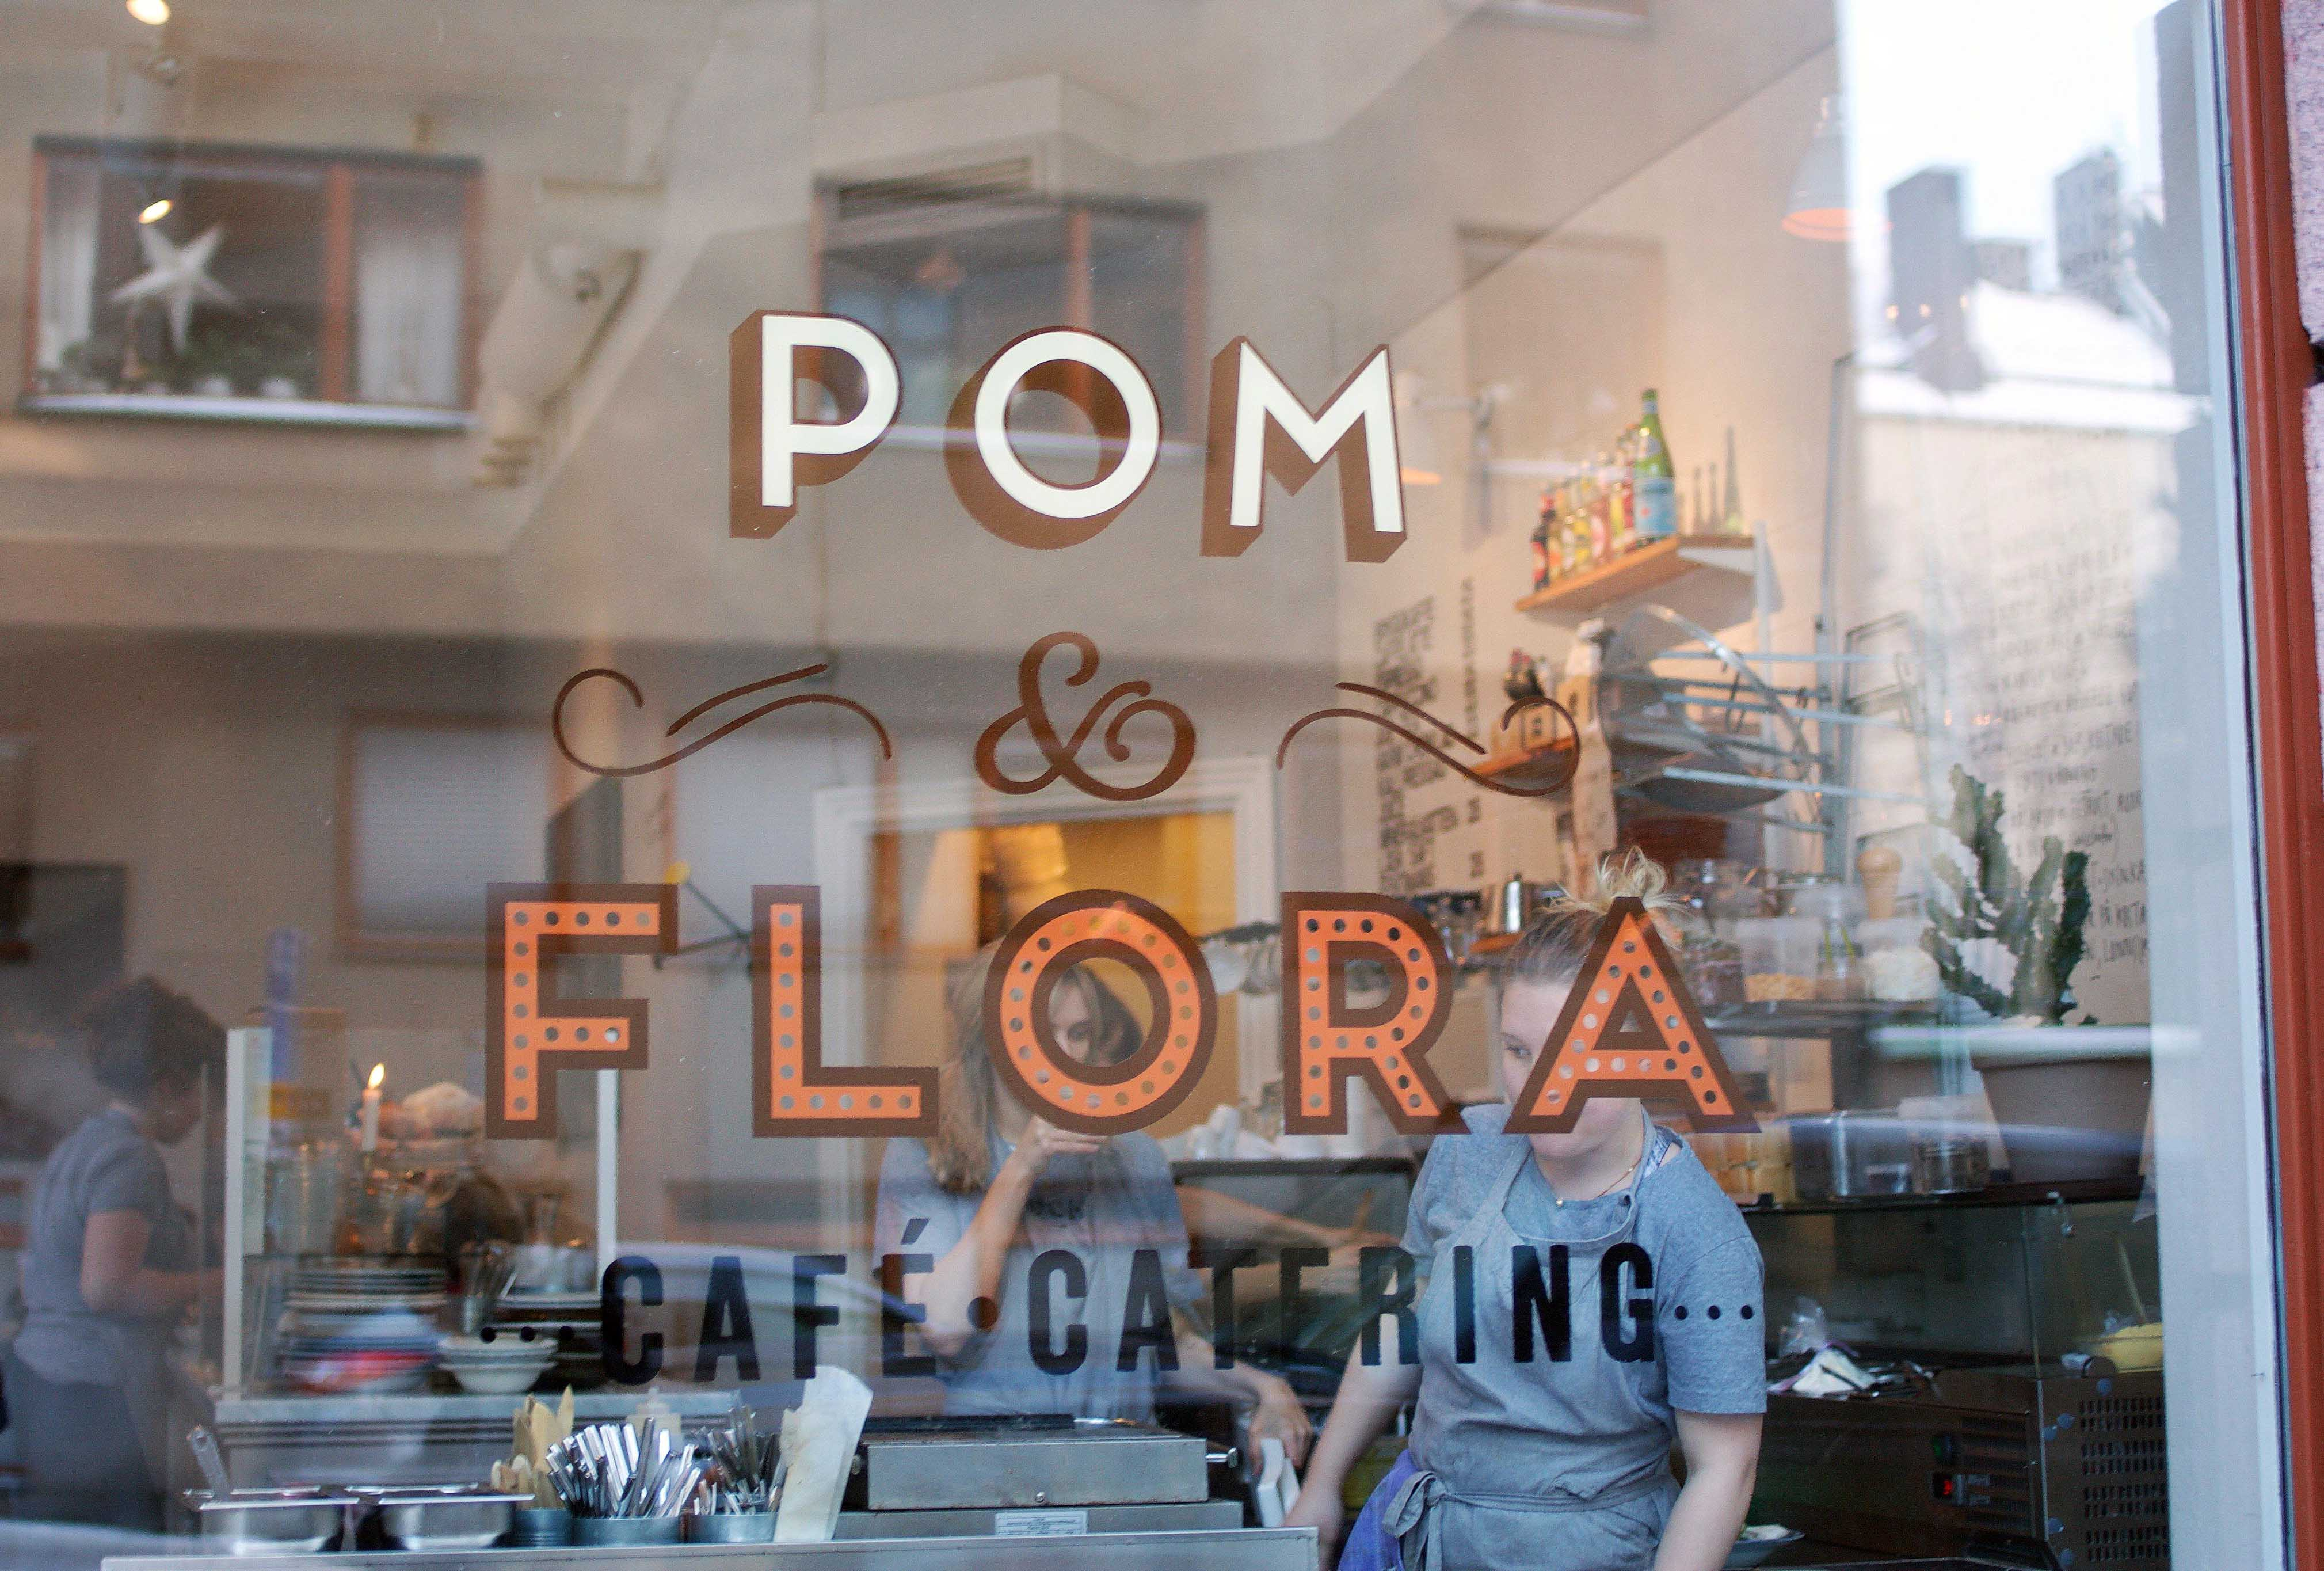 pom_and_flora.jpg